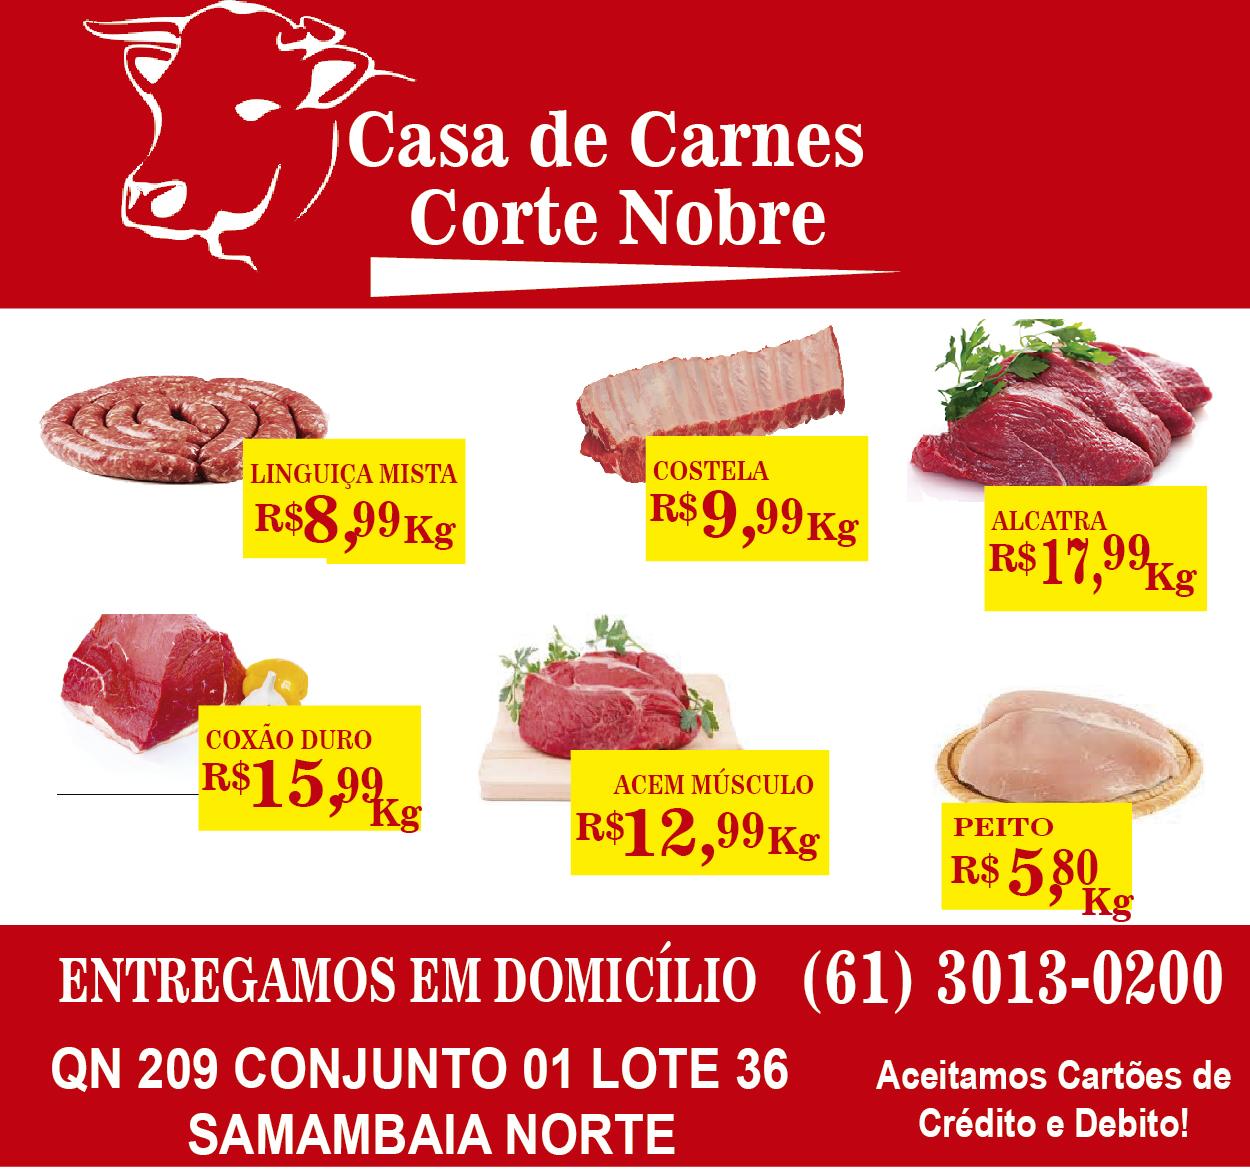 CASA DE CARNES CORTE NOBRE